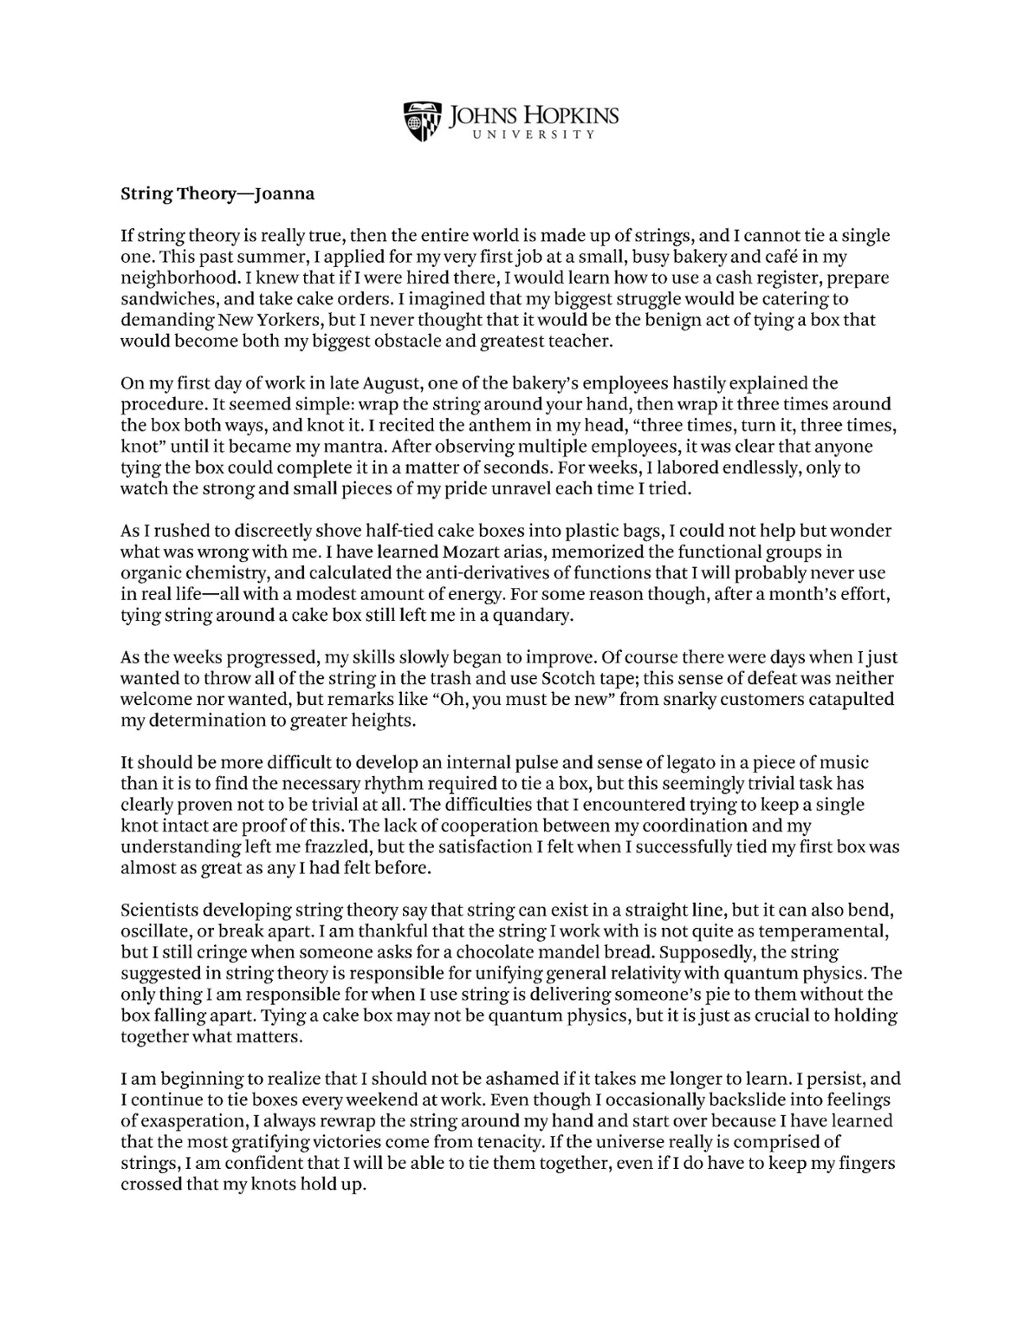 001 Essay Example John Hopkins Essays That Singular Worked Johns 2021 2018 2020 Full